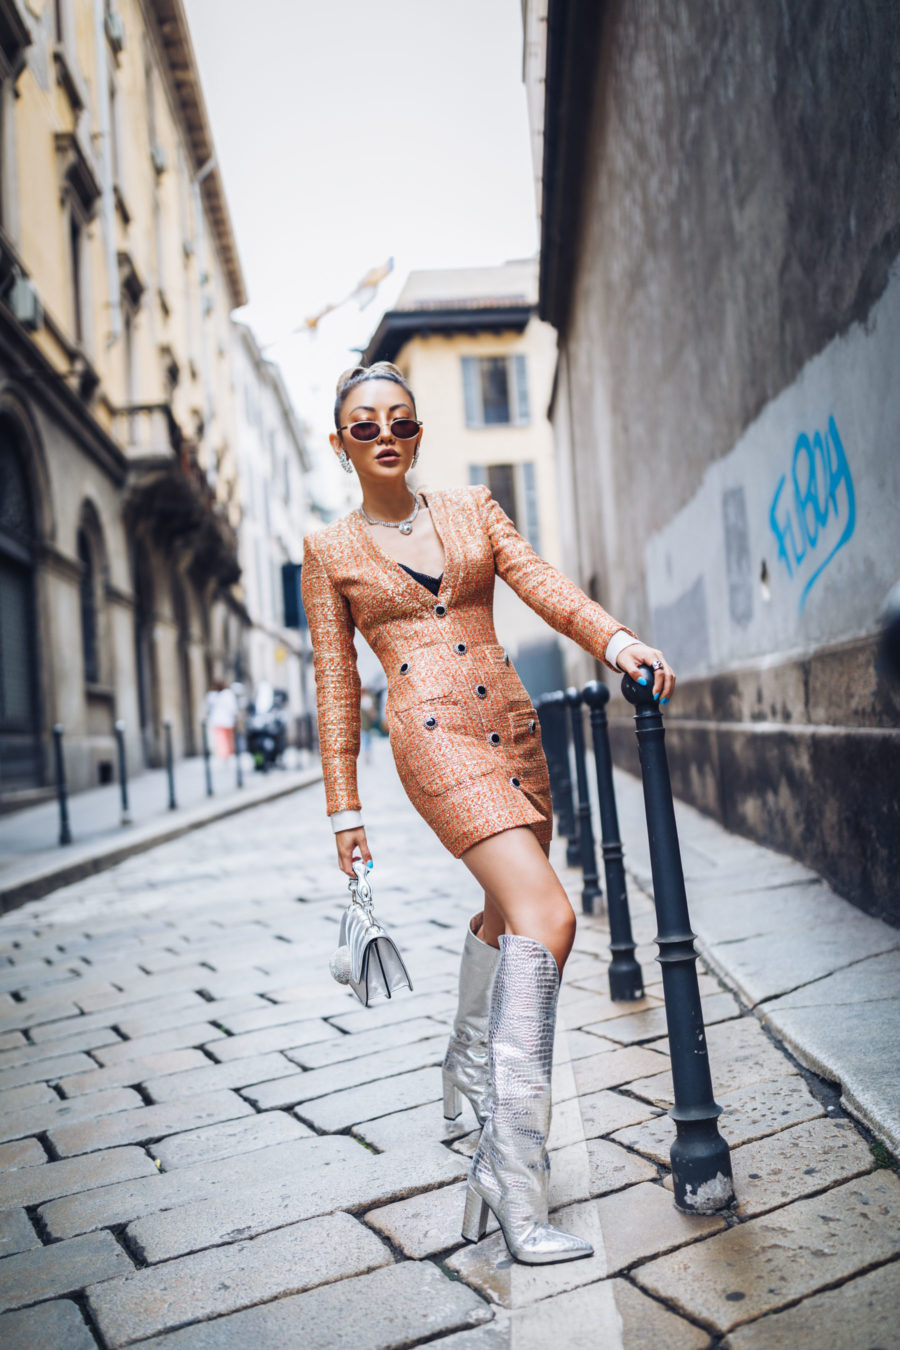 evening looks, tweed dress, metallic boots, croc embossed boots, blazer dress trend // Notjessfashion.com